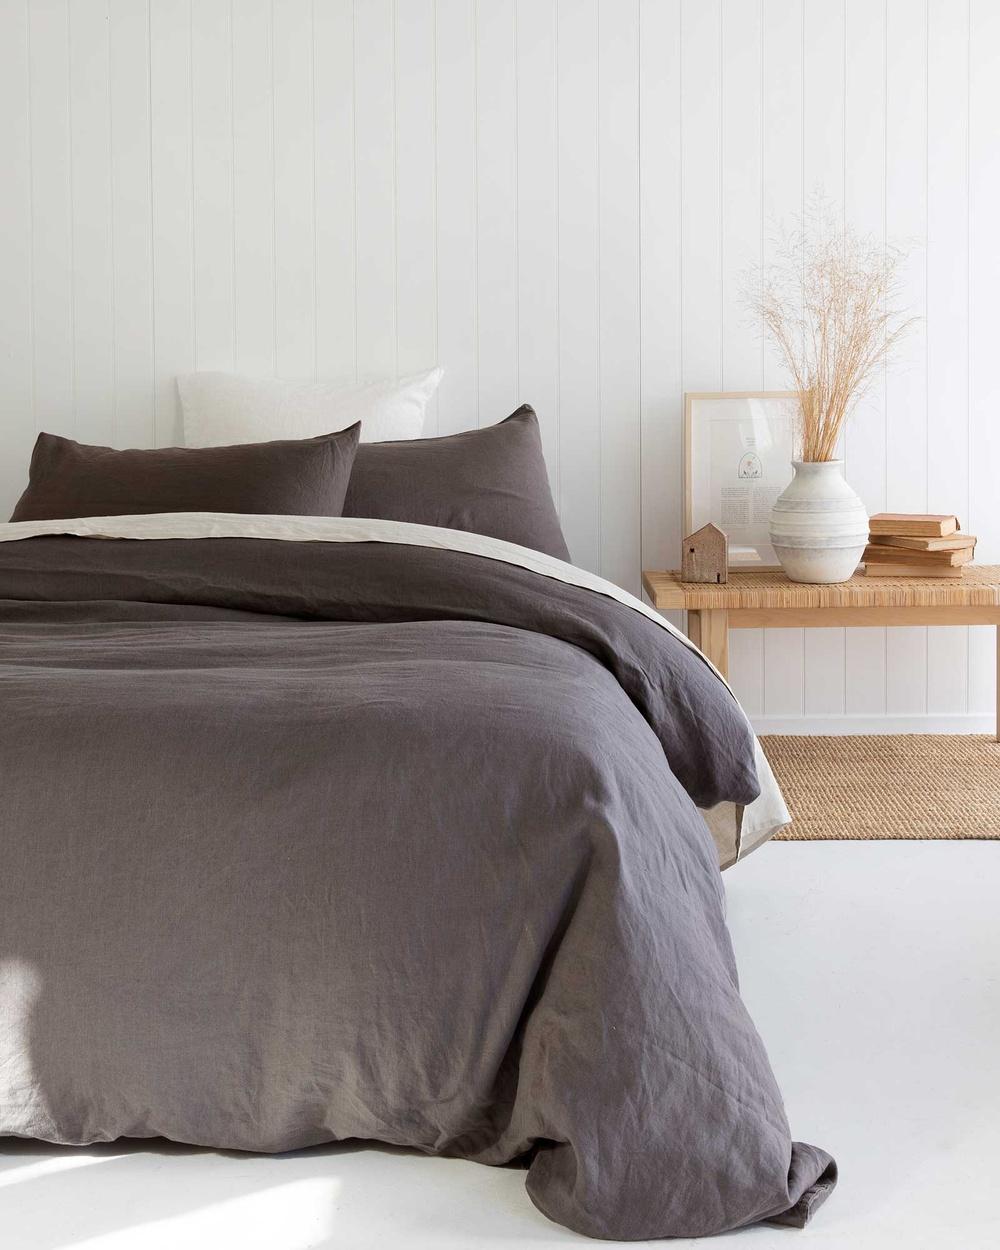 Carlotta + Gee 100% Linen Duvet Cover Home Grey Australia